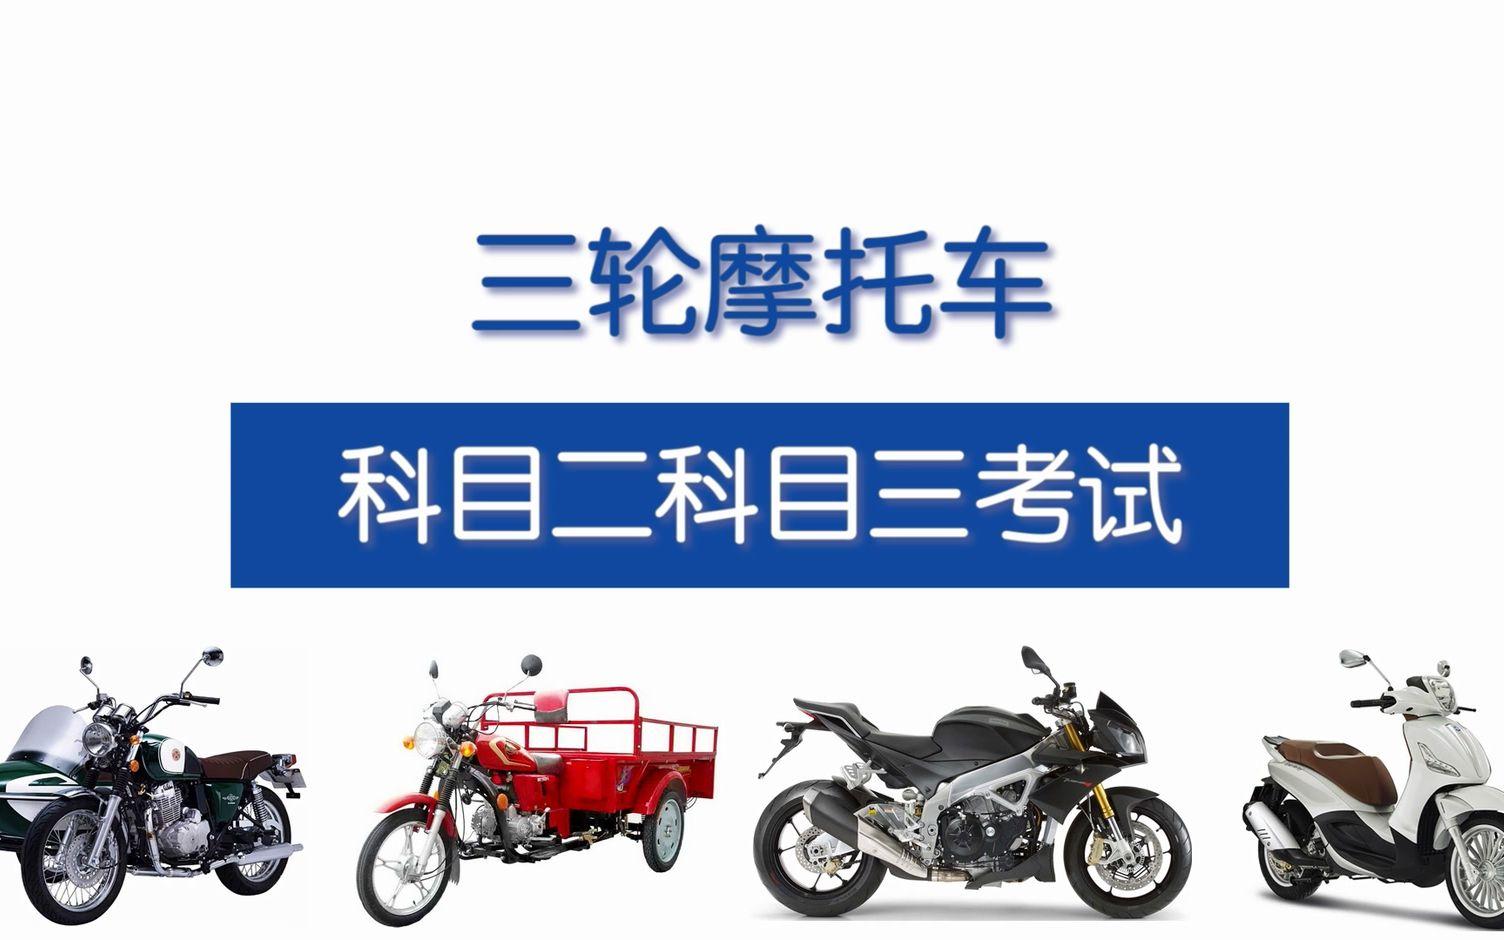 b二科目二考试十六项视频_D照三轮摩托车科目二科目三考试_哔哩哔哩 (゜-゜)つロ 干杯~-bilibili